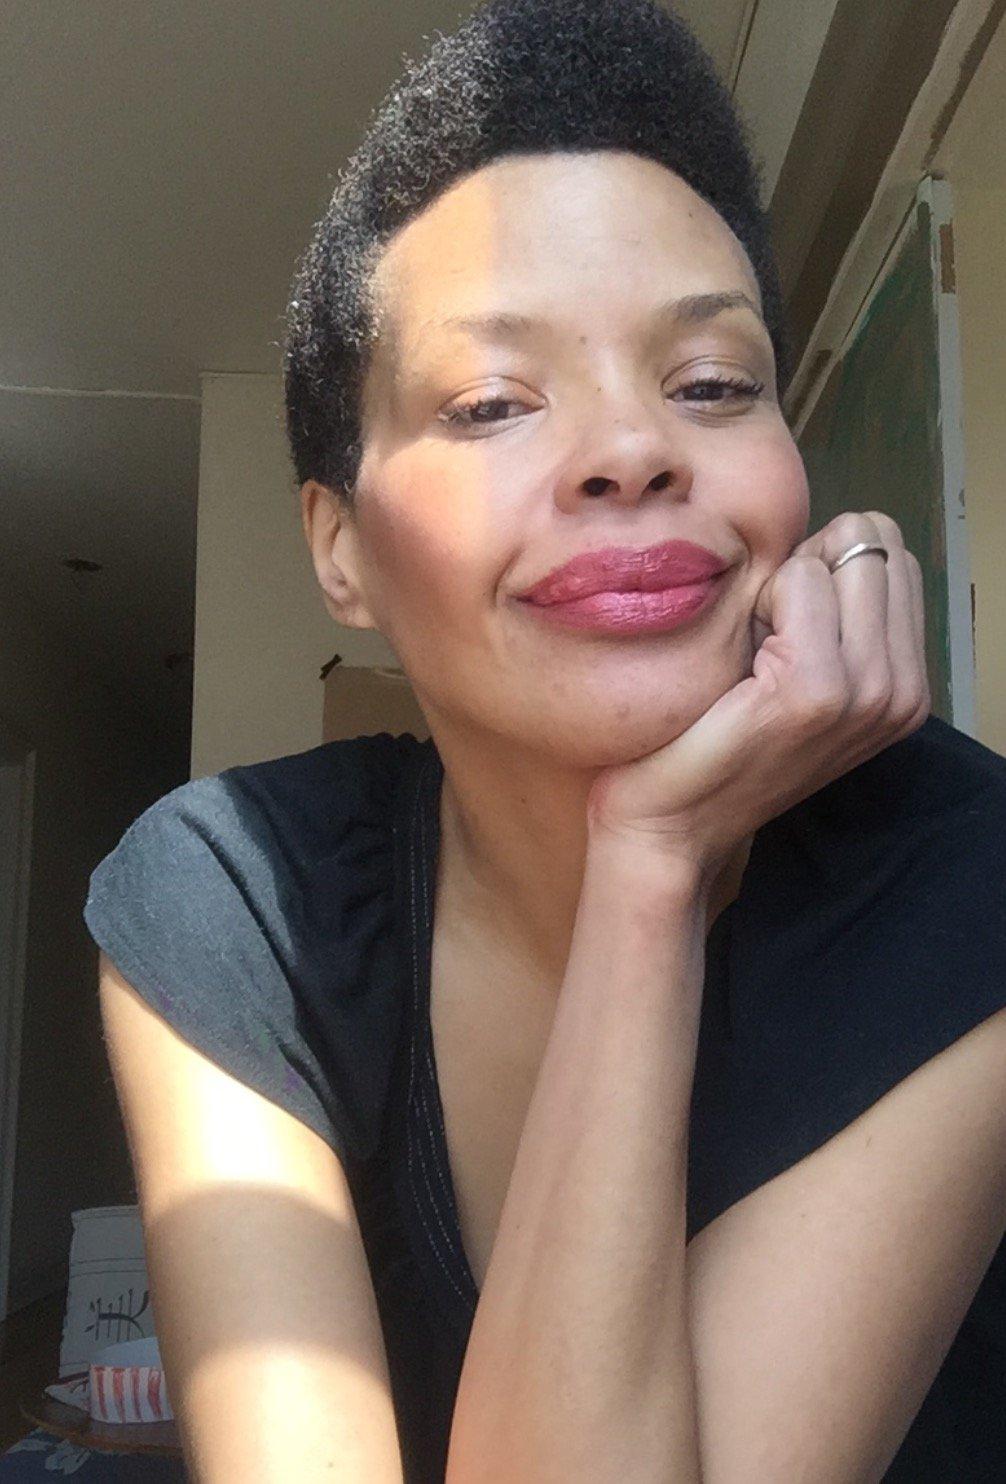 Got Veges? Actress & Author Esosa E. Gives Us the Skinny on Vegan Life